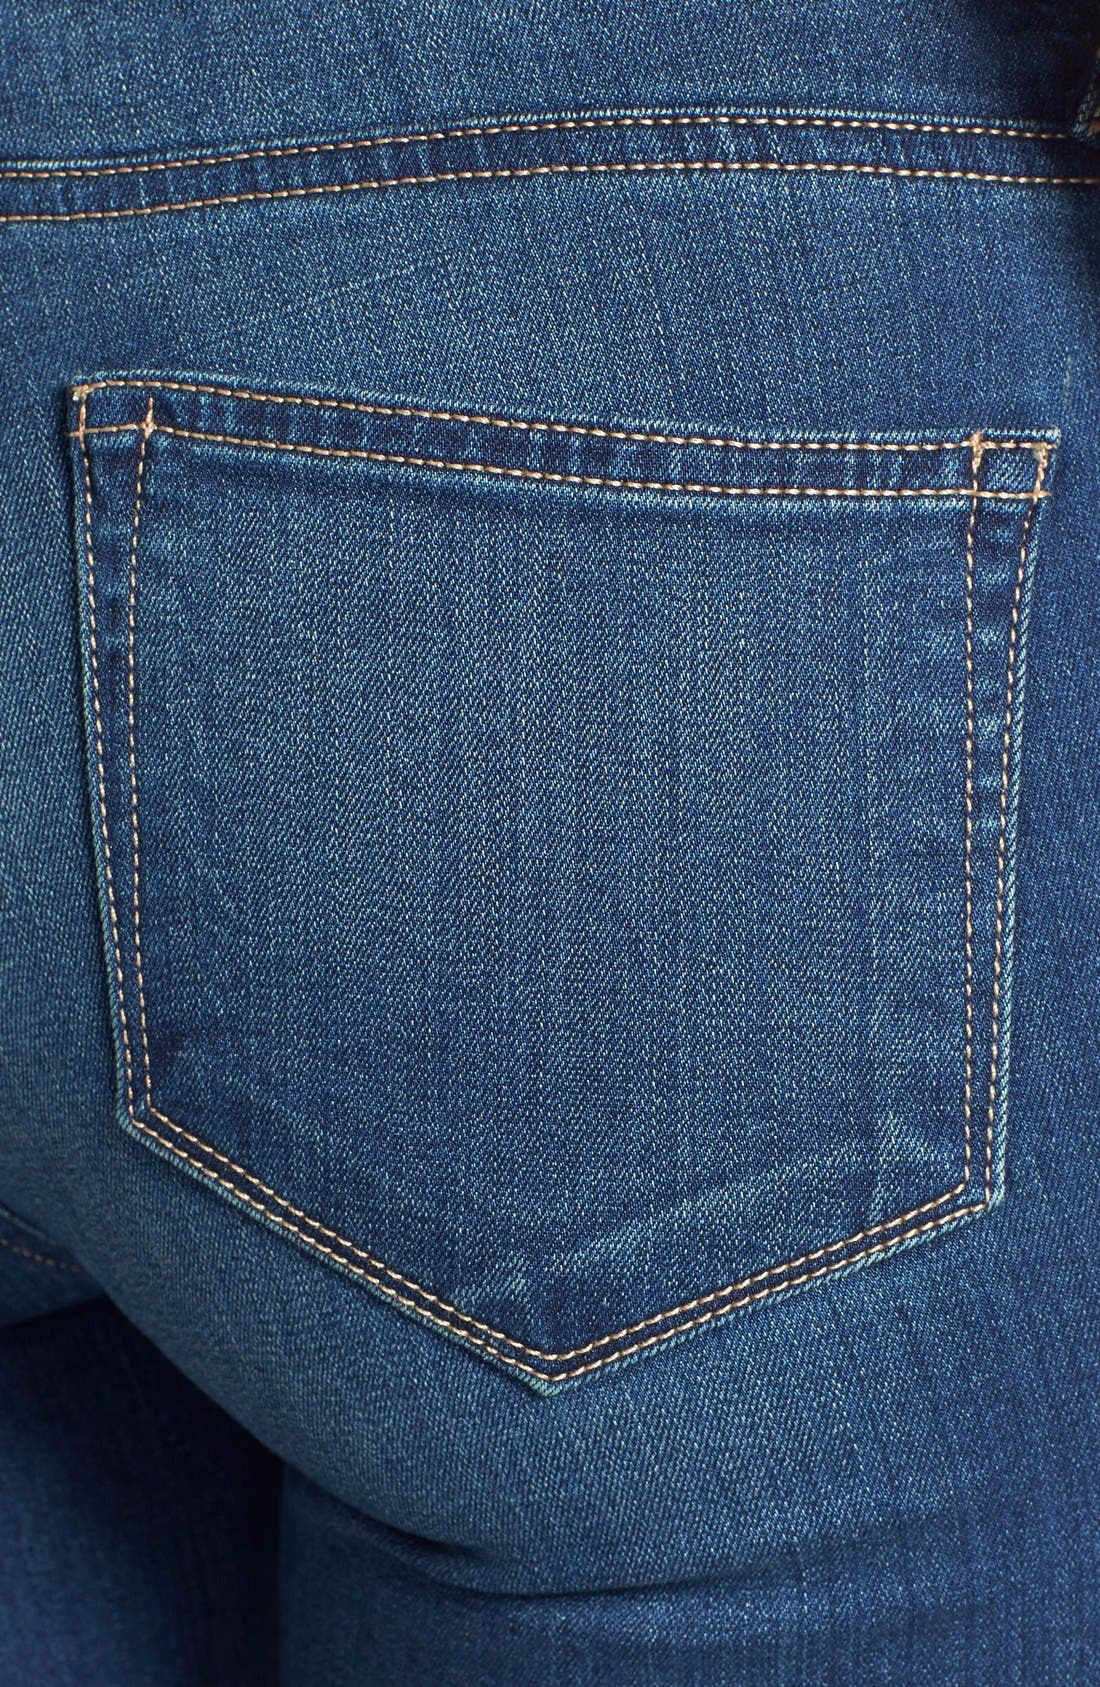 Alternate Image 3  - Paige Denim 'Indio' Zip Detail Ultra Skinny Jeans (Easton No Whiskers)